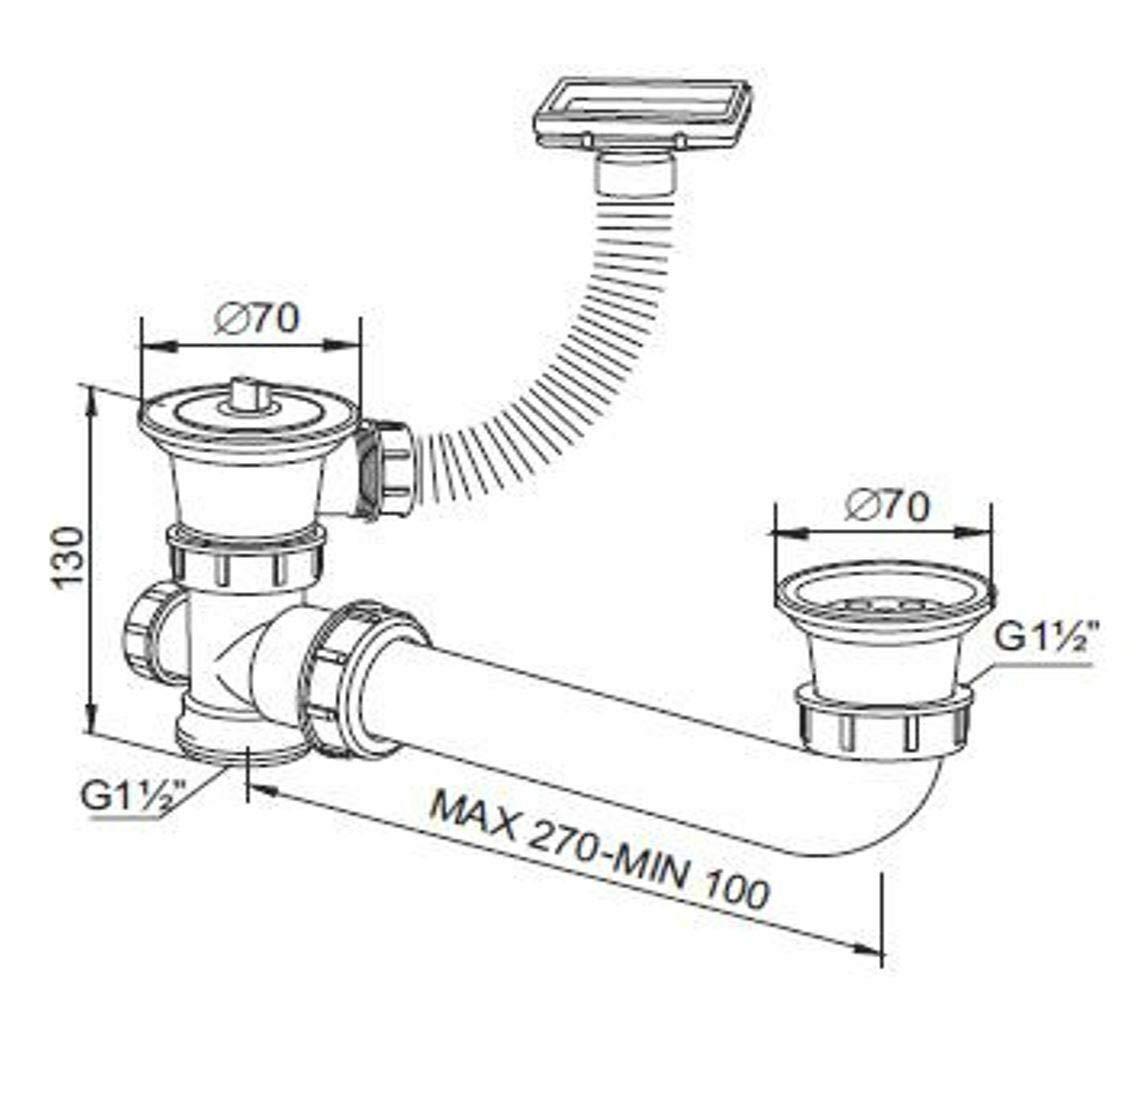 Doppel Gr/ö/ßen verstelbar Sifon f/ü Doppelsp/üle Ablaufgarnitur horizontal /Überlauf